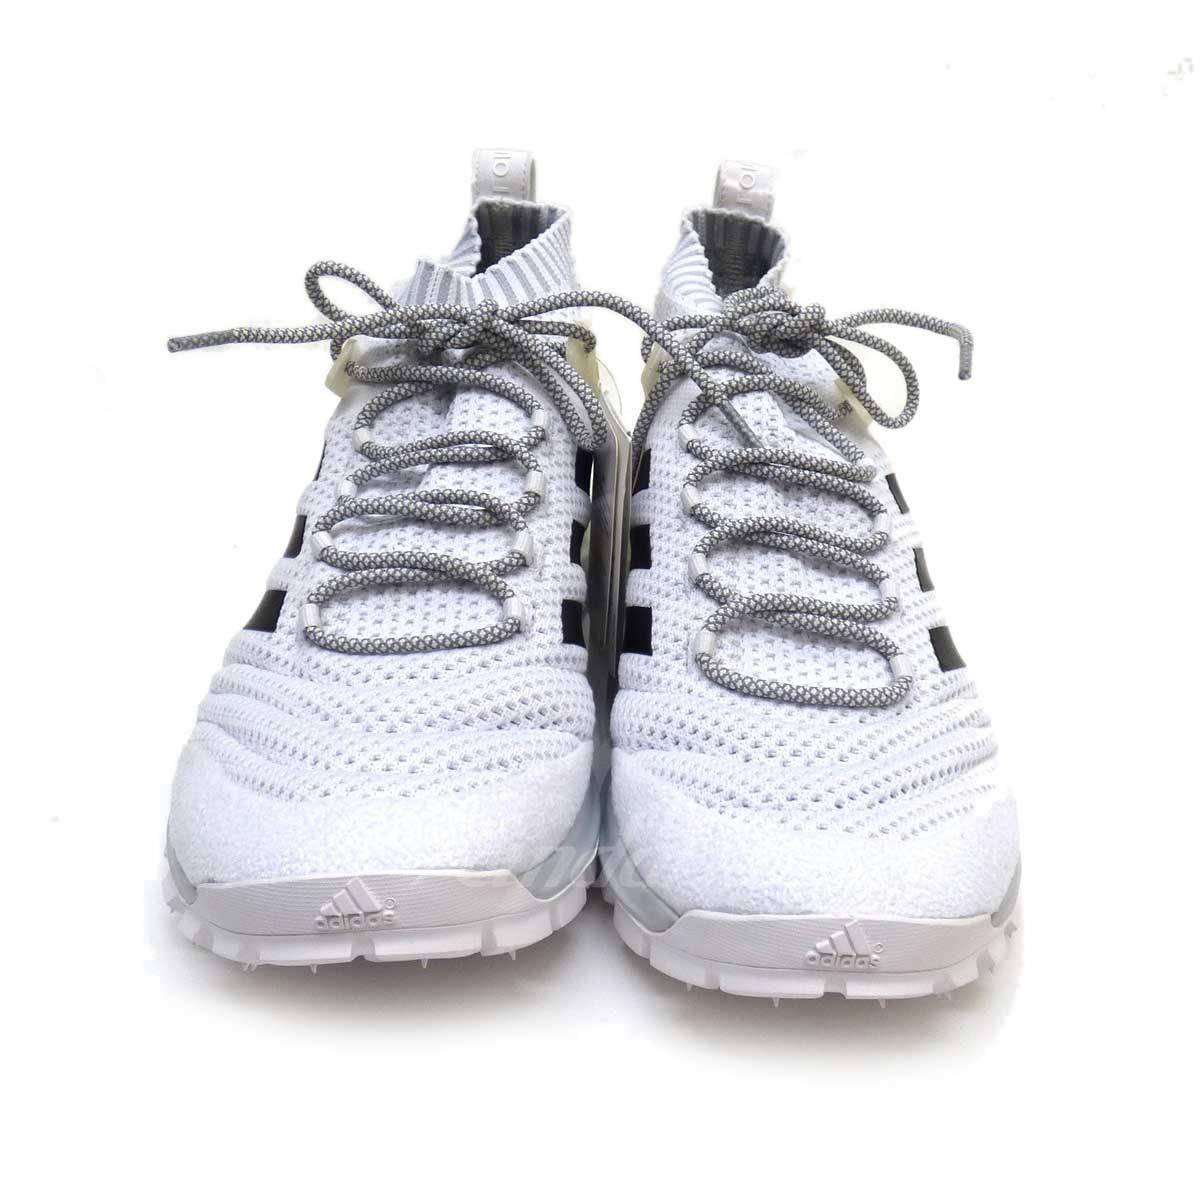 637f8cffa899 Gosha Rubchinskiy X adidas GR COPA MID PK sneakers white size  28 (go  Schalla butyne ski Adidas)